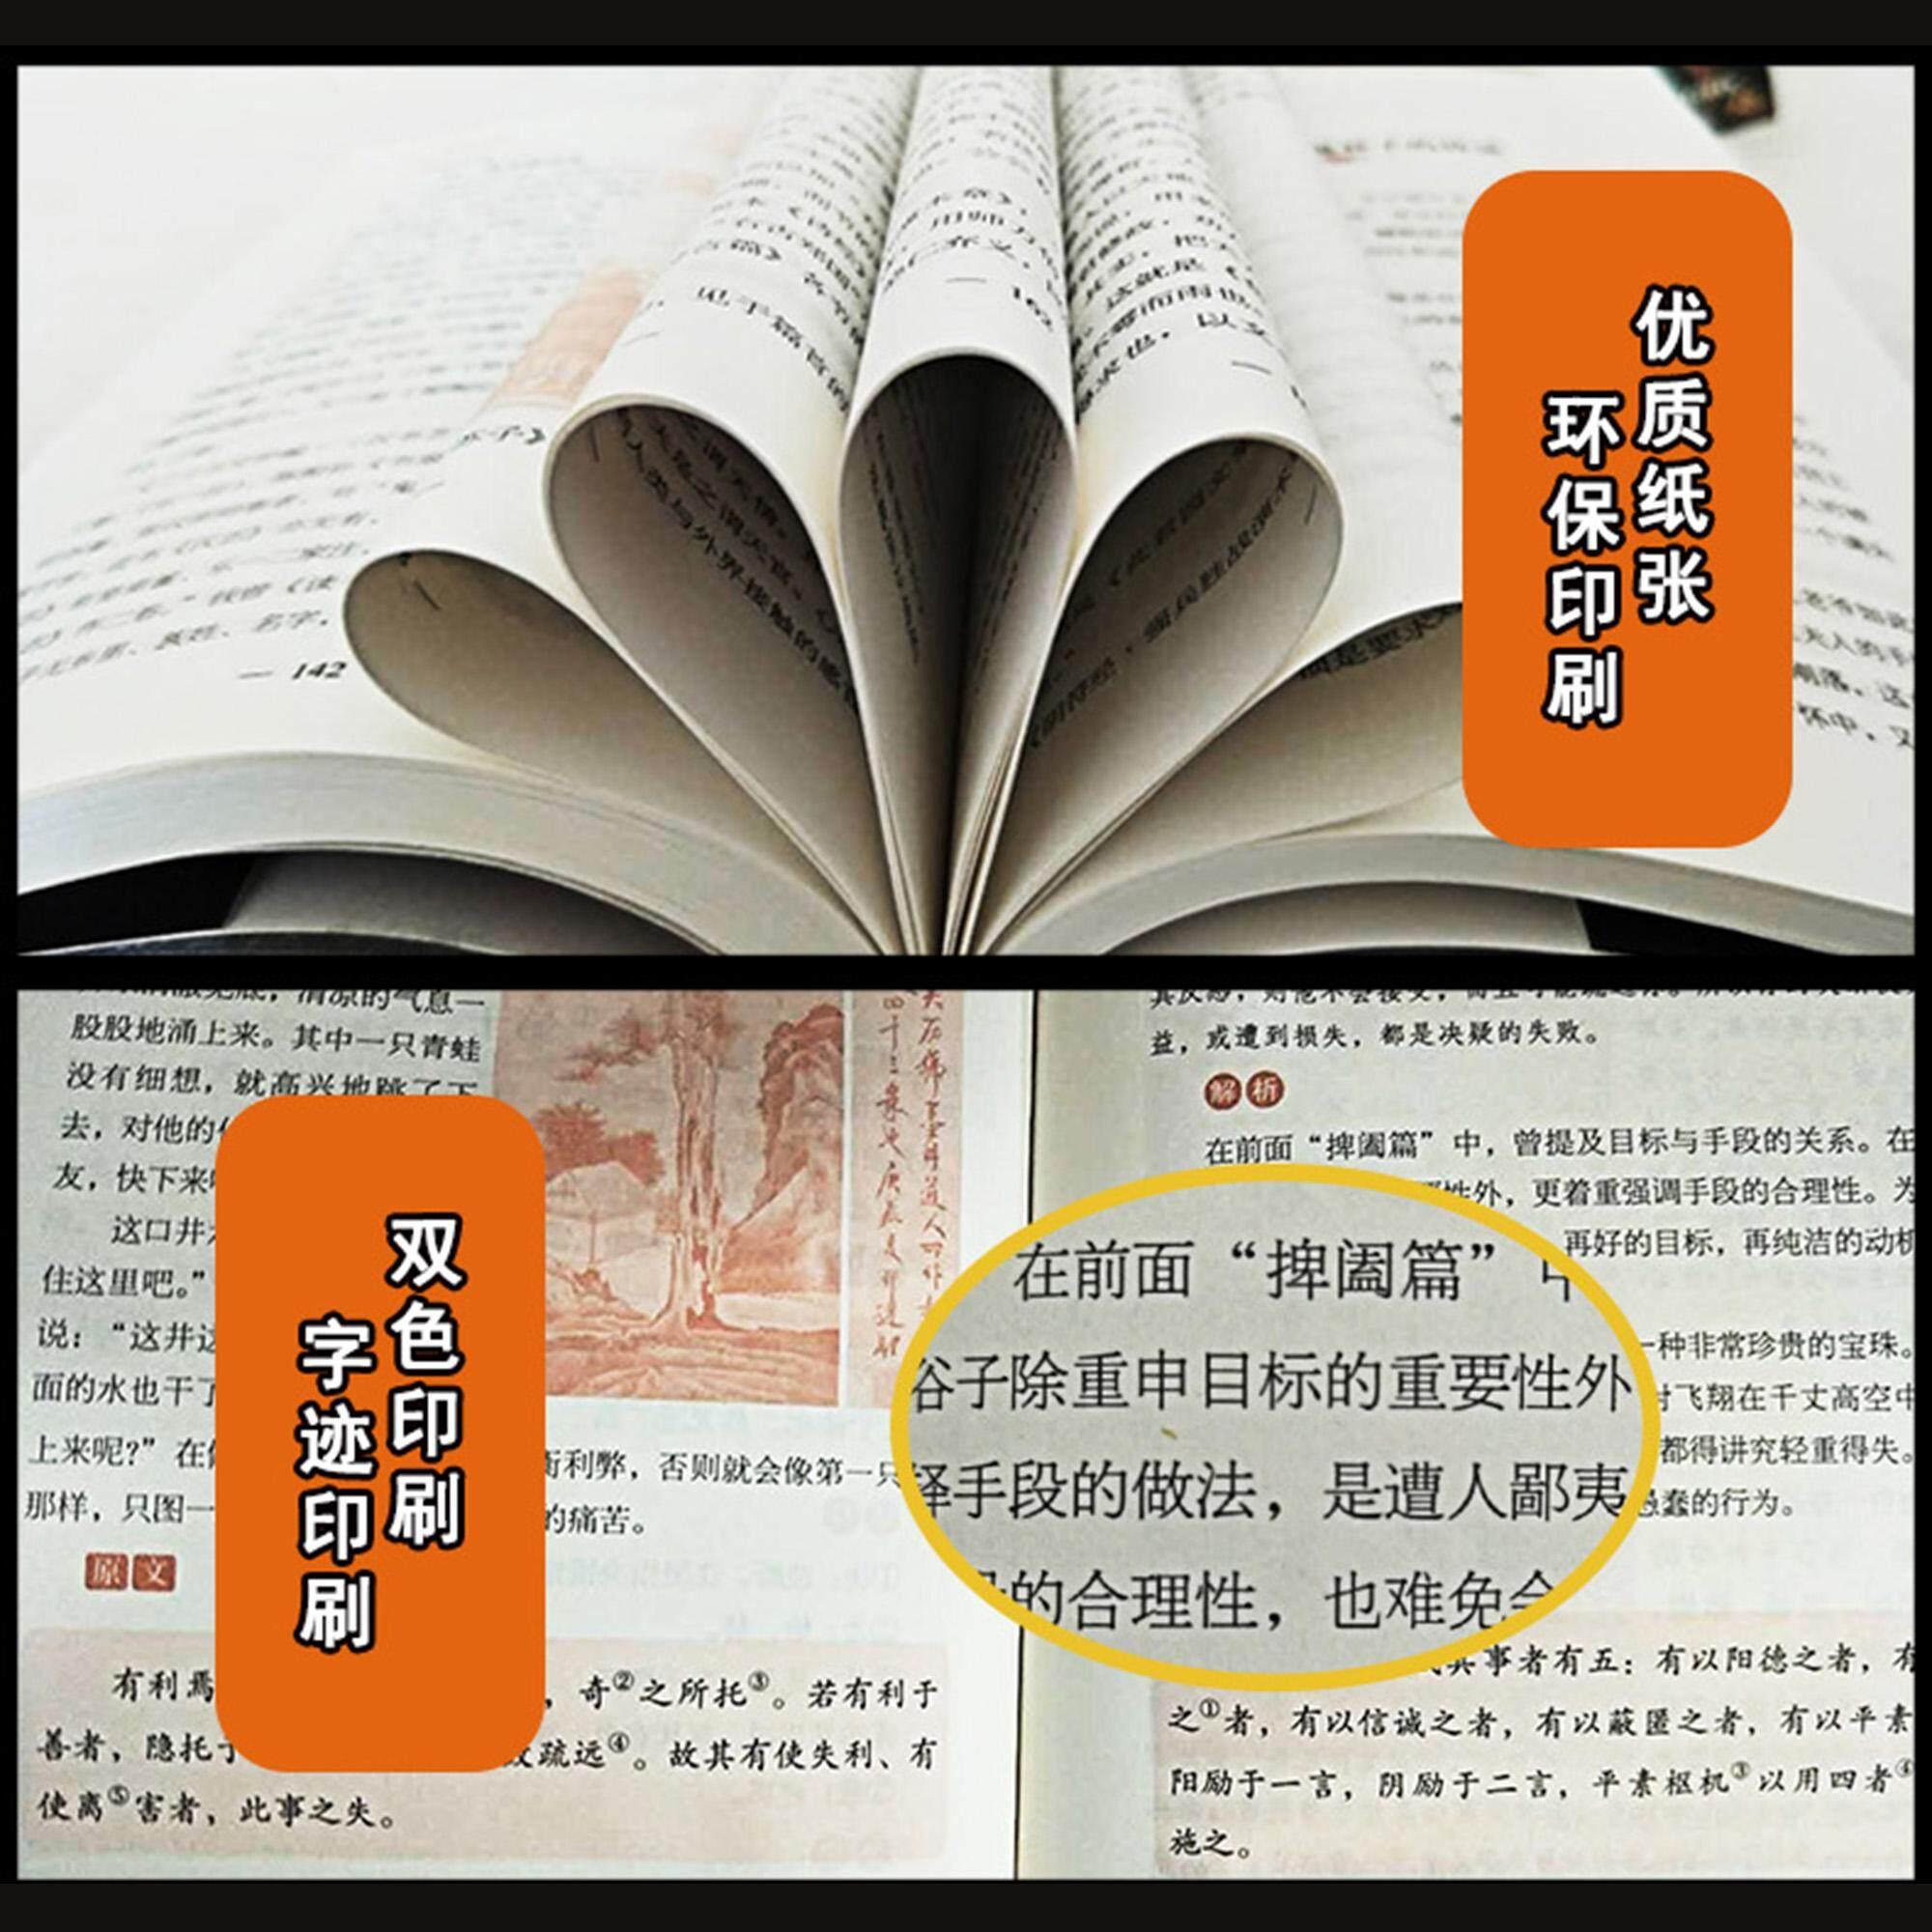 EQ 2 Books_Series 9 (+)